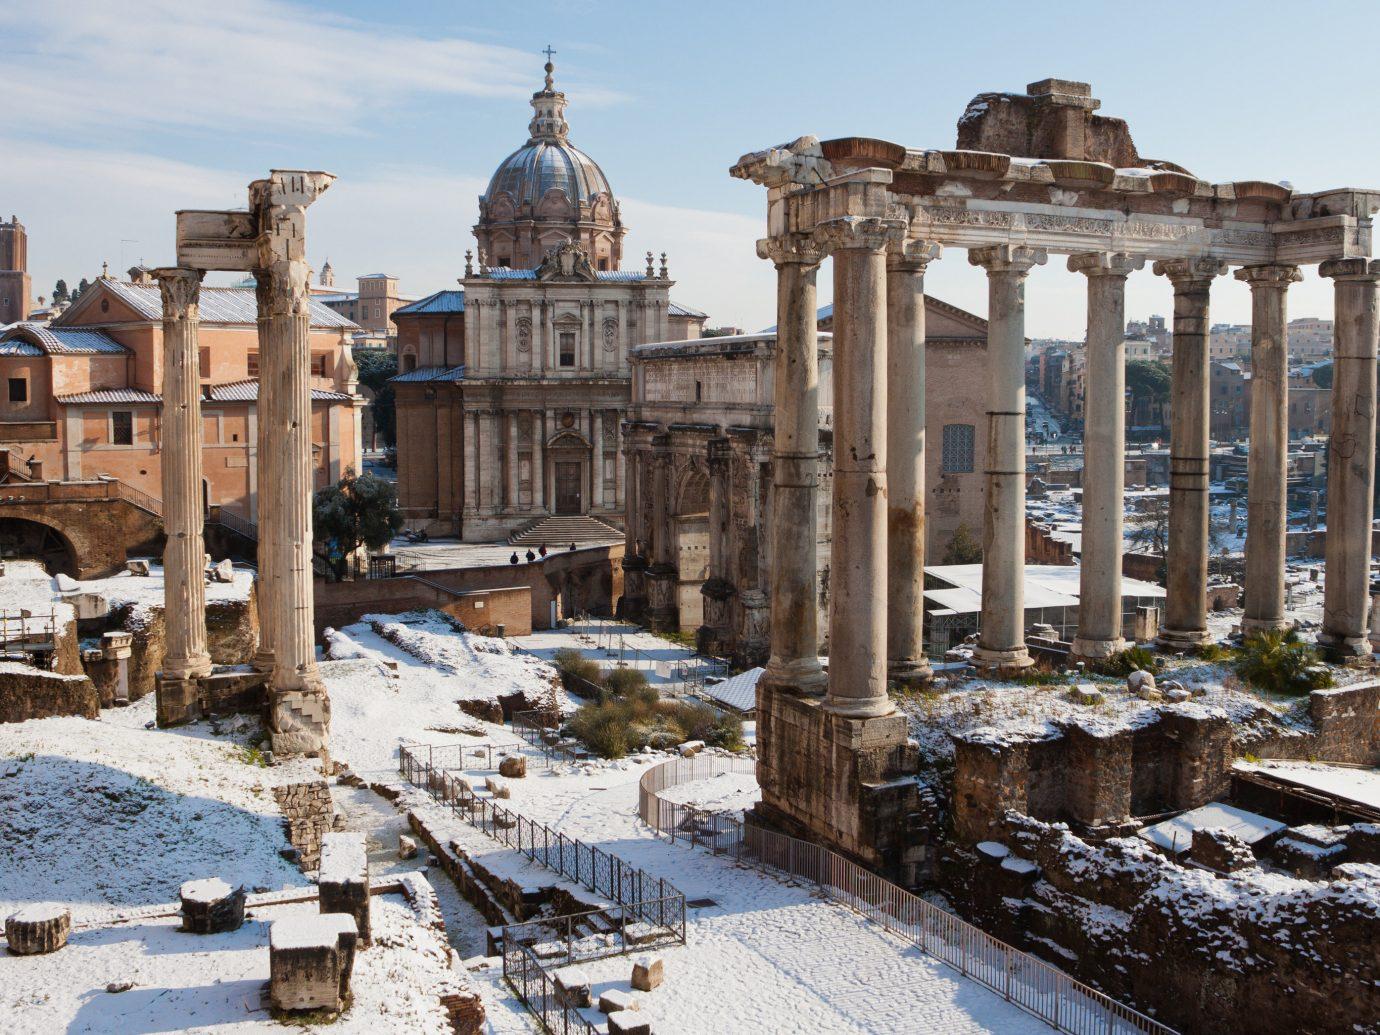 snowy ruins in Rome